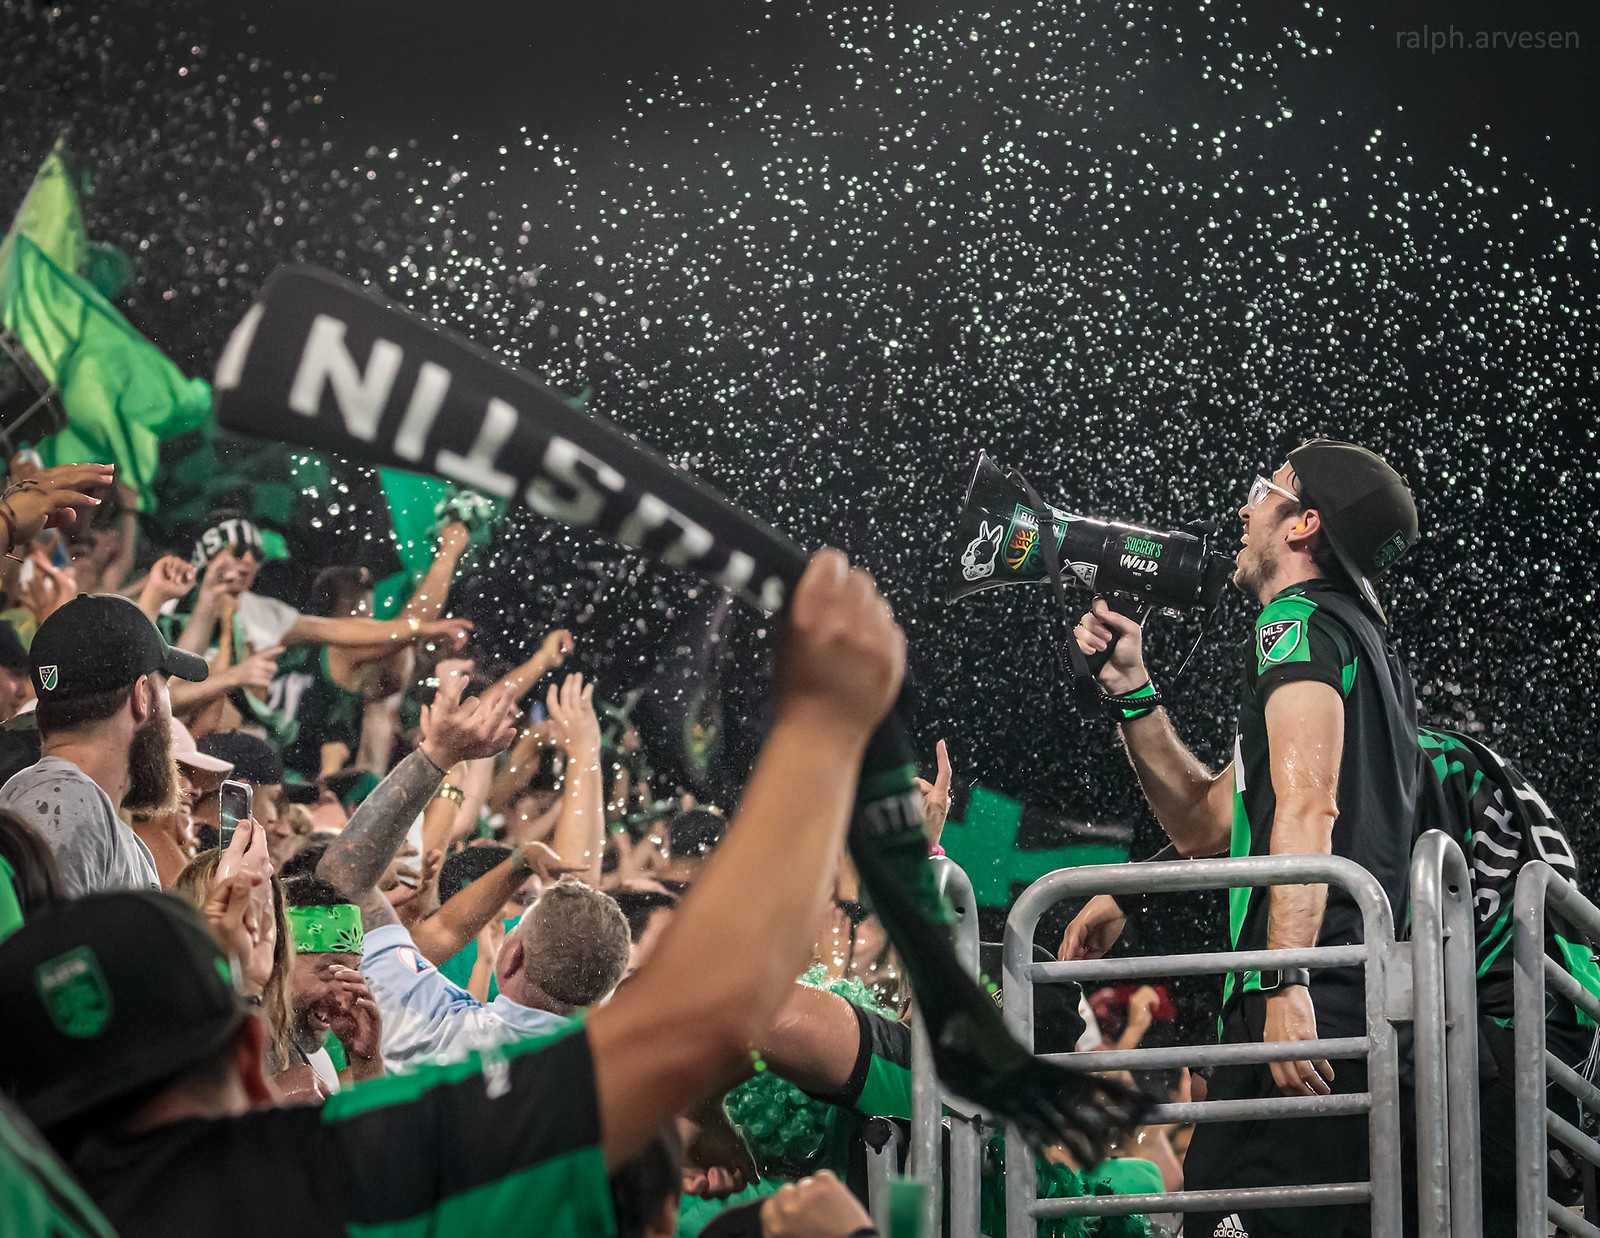 Austin FC | Texas Review | Ralph Arvesen